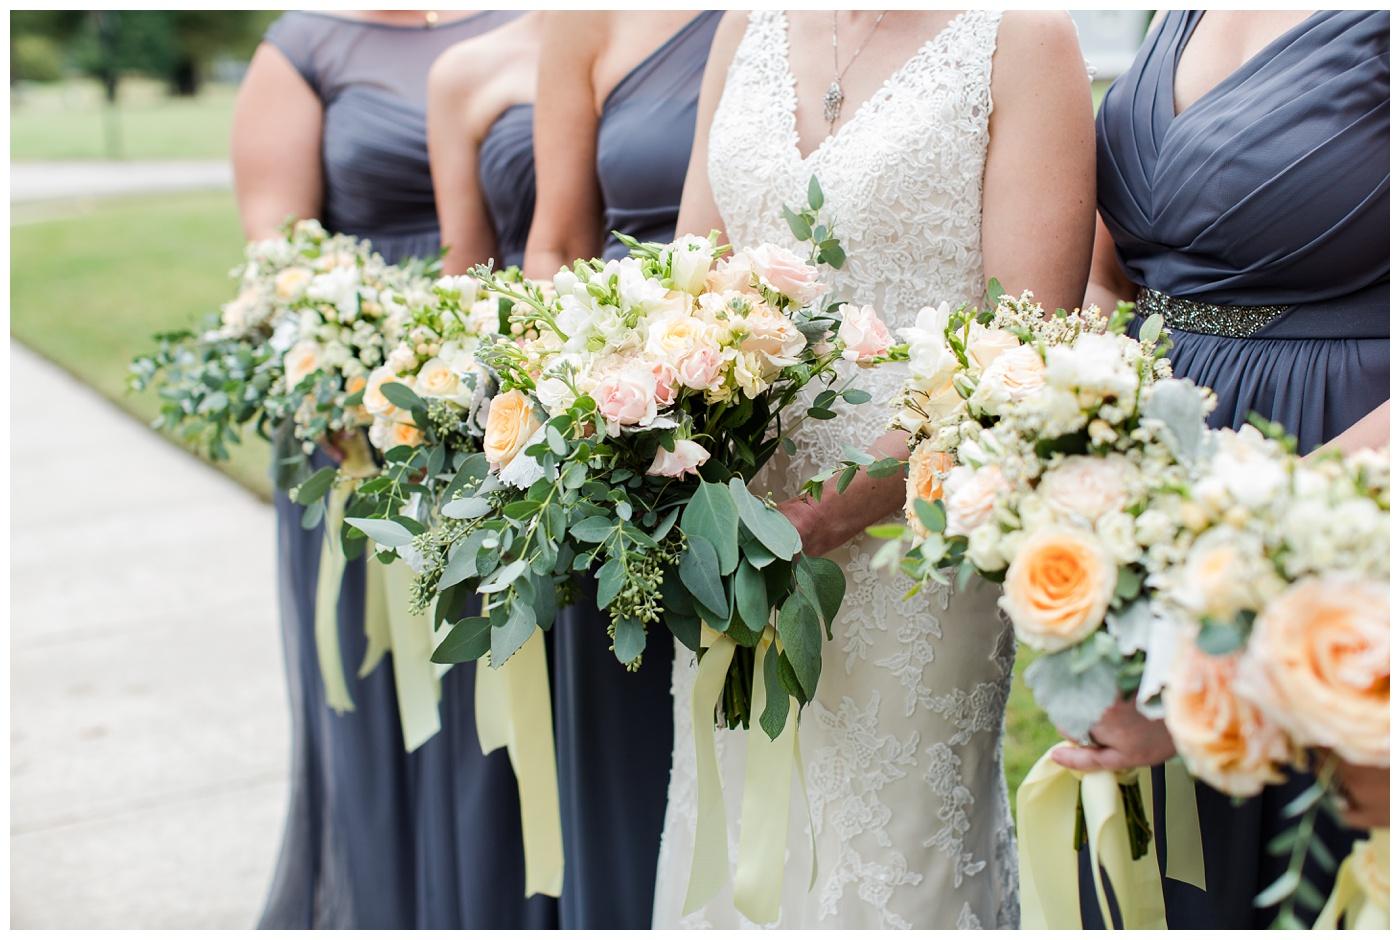 Emily & Hogan | Cape Charles Outdoor Backyard Fall Wedding